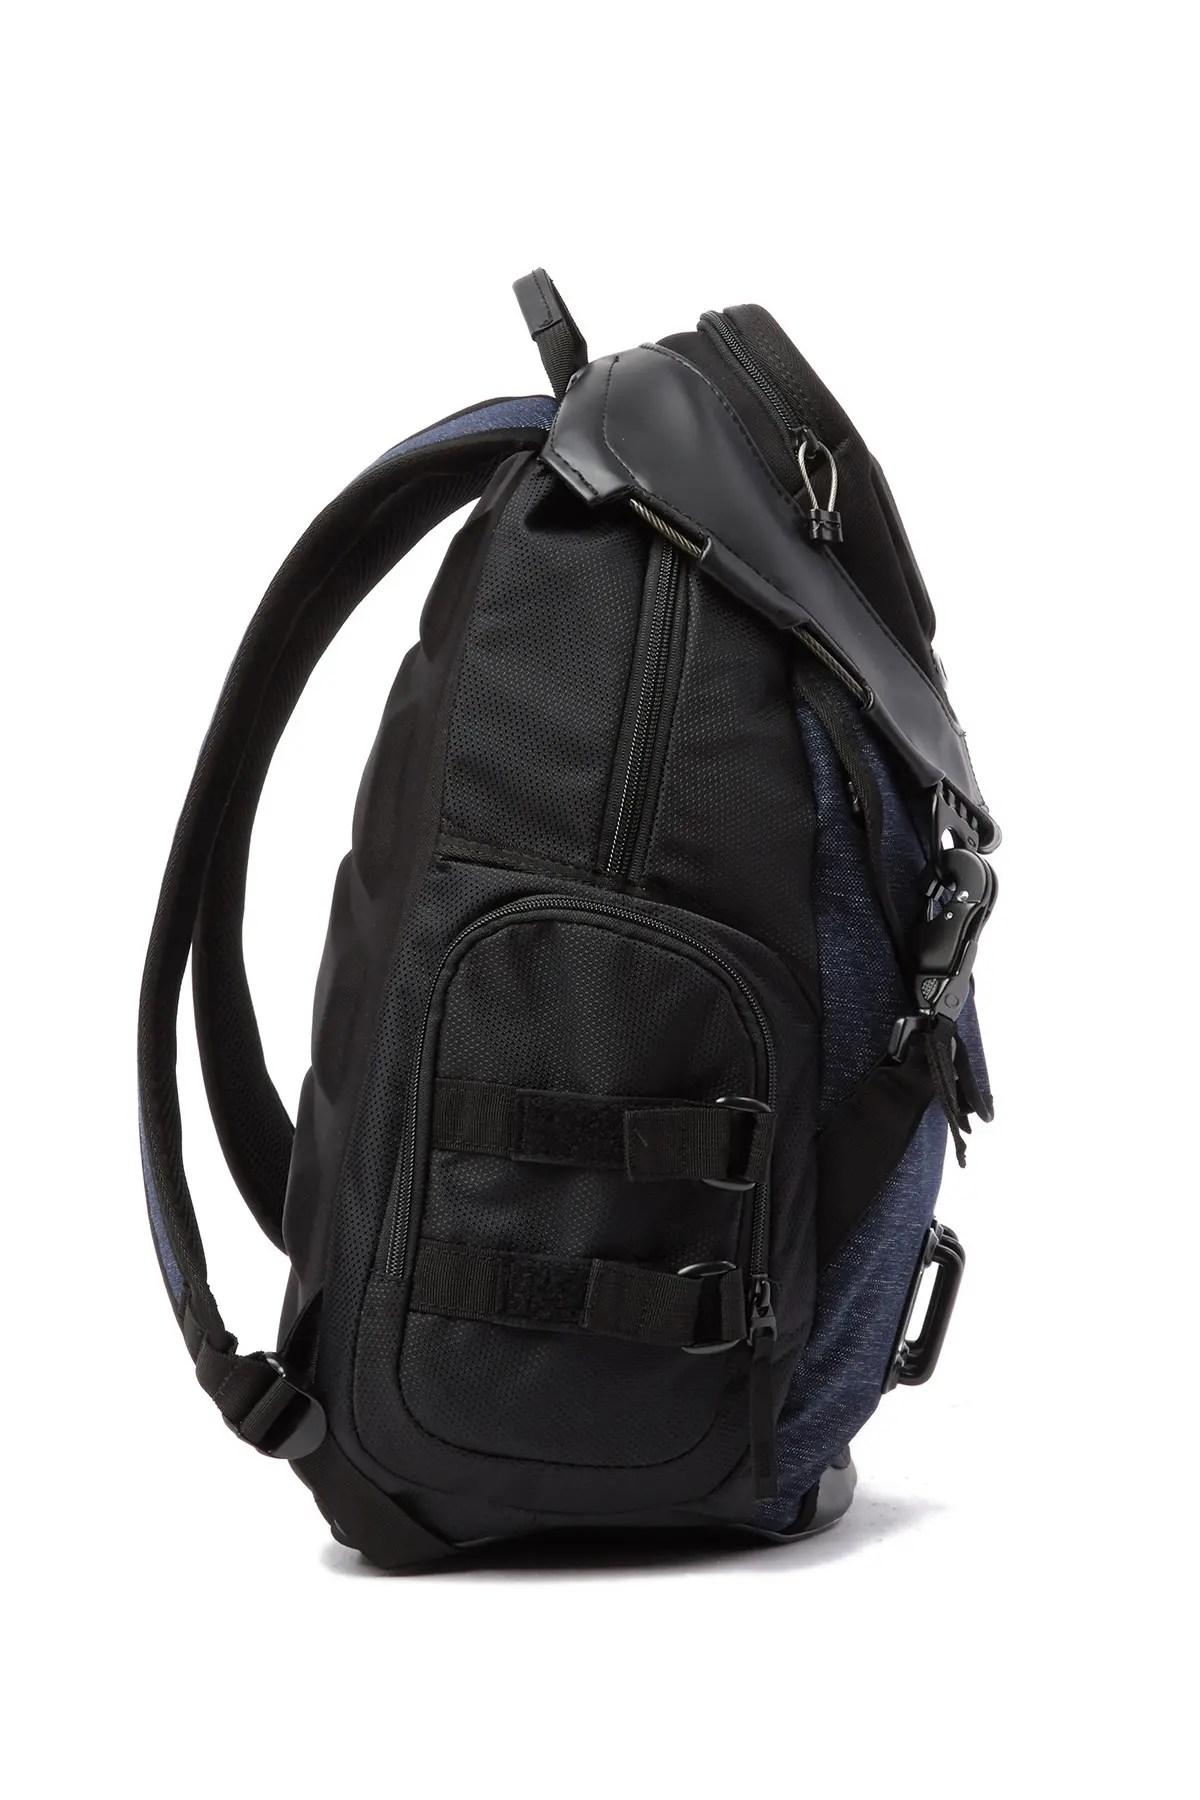 oakley bathroom sink lx backpack nordstrom rack